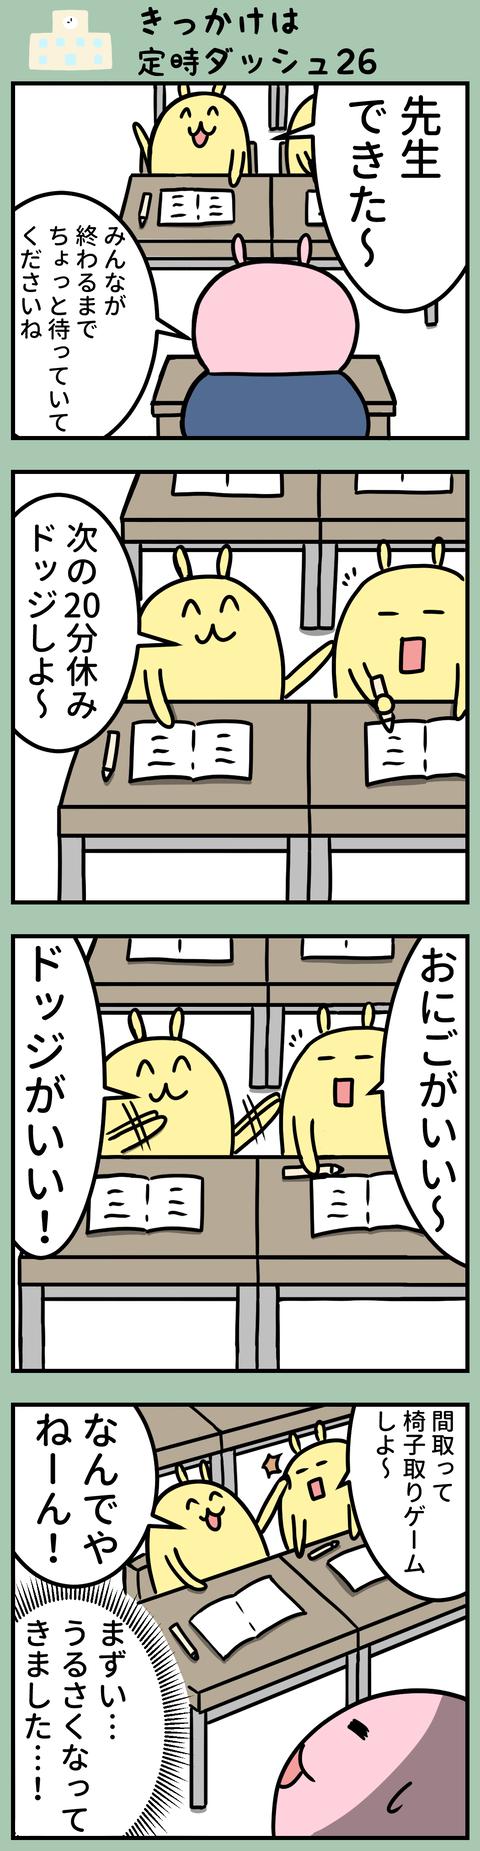 manga-yuzuporo87-1